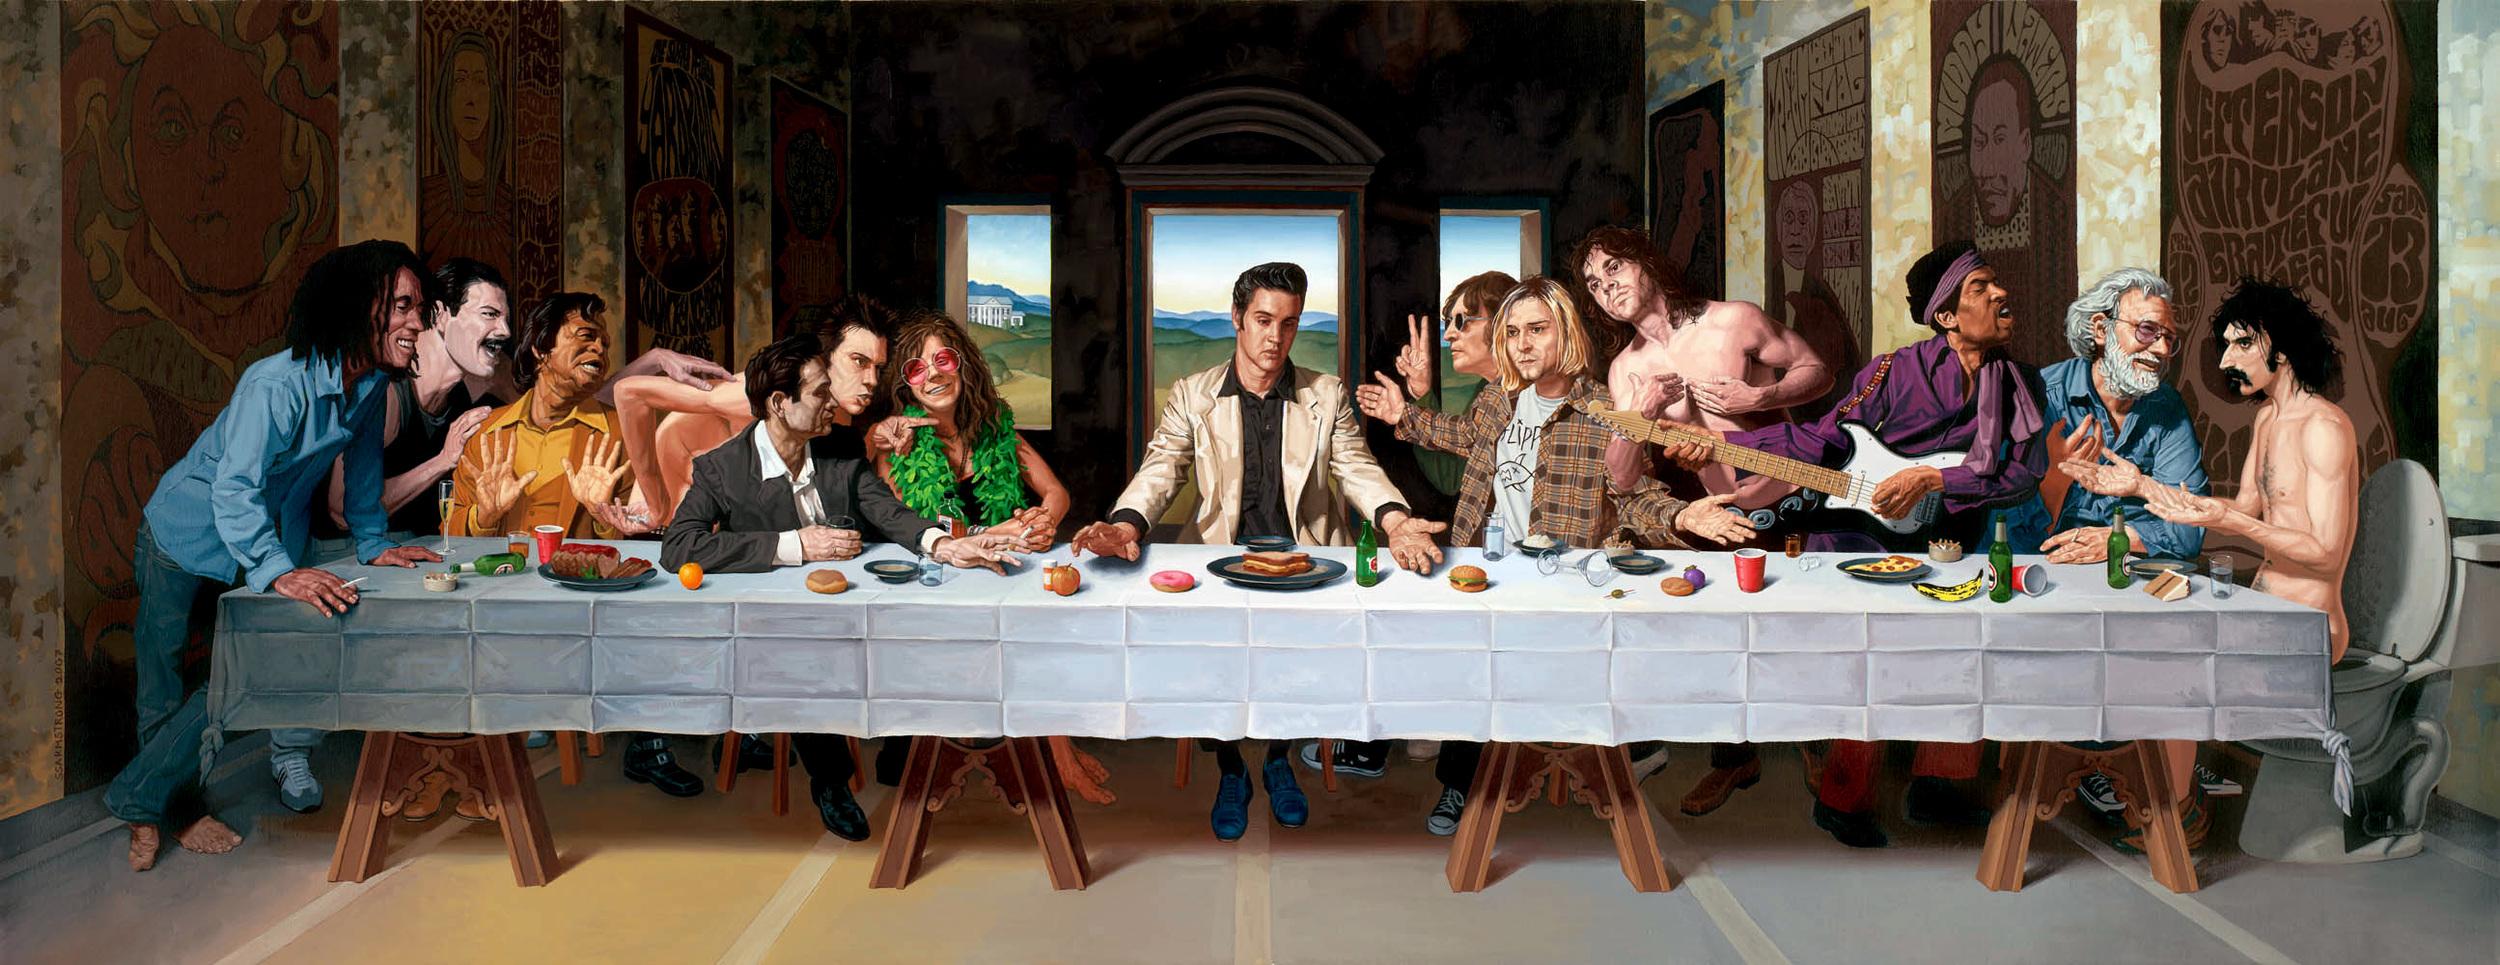 Hard Rock Supper